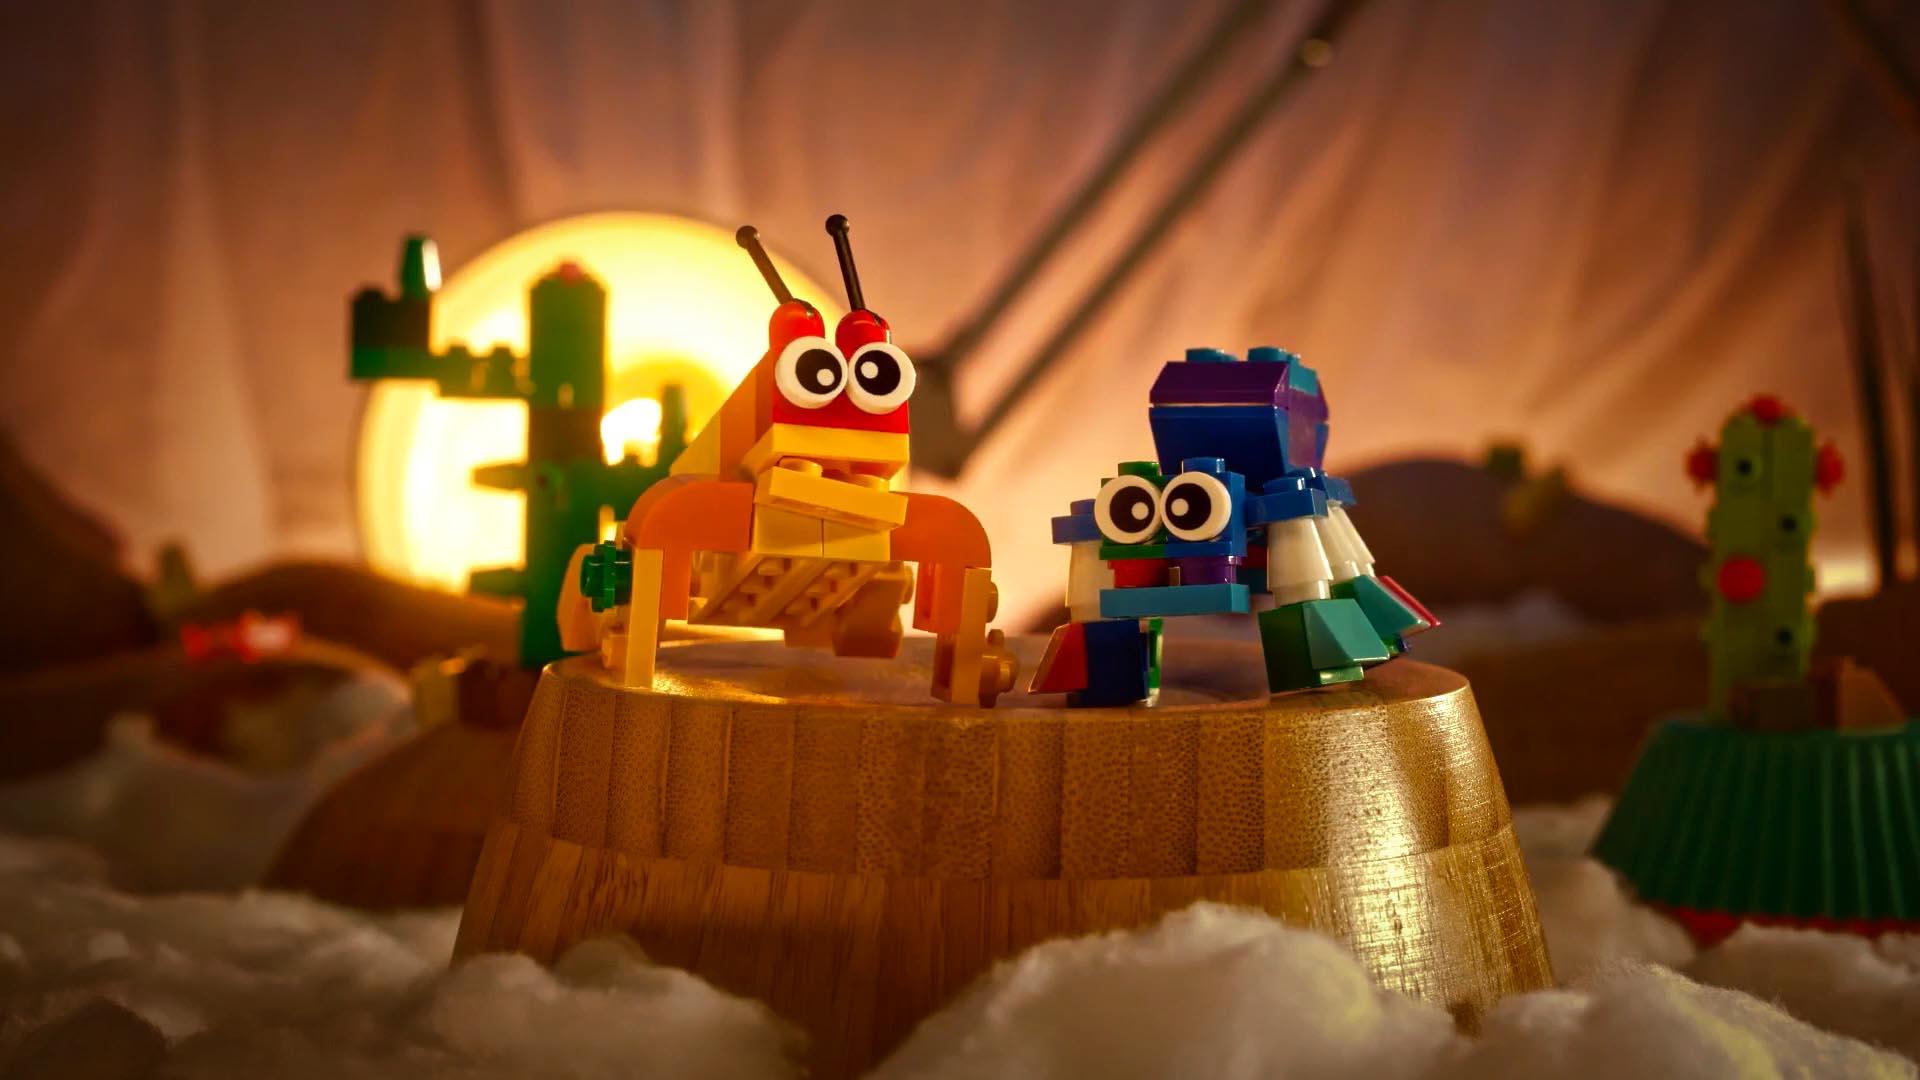 BA_Web_LegoCSSC_PR_03